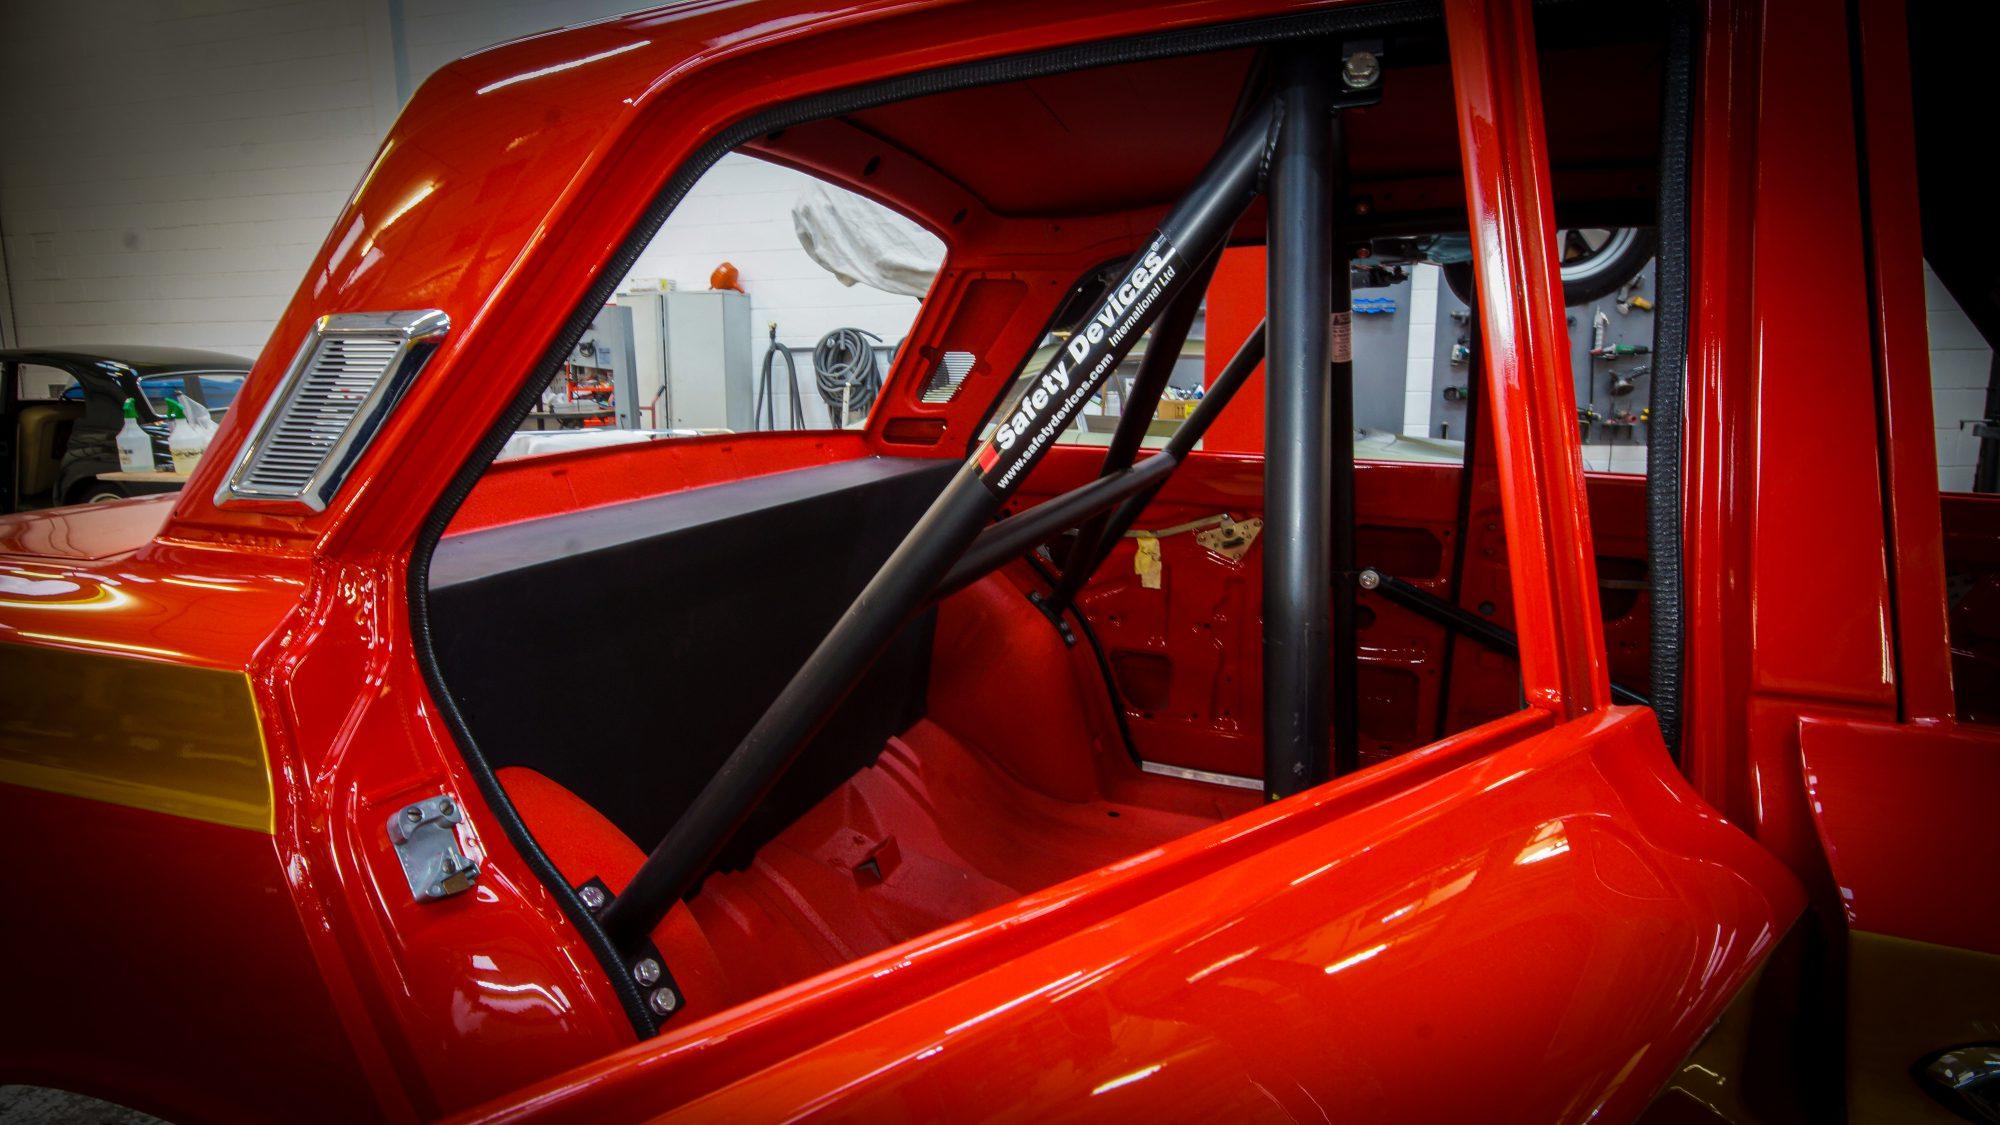 Ford, Ford Cortina, Project '65, 1965 Cortina GT, GT, Cortina GT, FIA race car, Burton Power, Throbnozzle Racing, classic car, retro car, motoring, automotive, track car, fast road car, race car, carandclassic, Norfolk Premier Coachworks